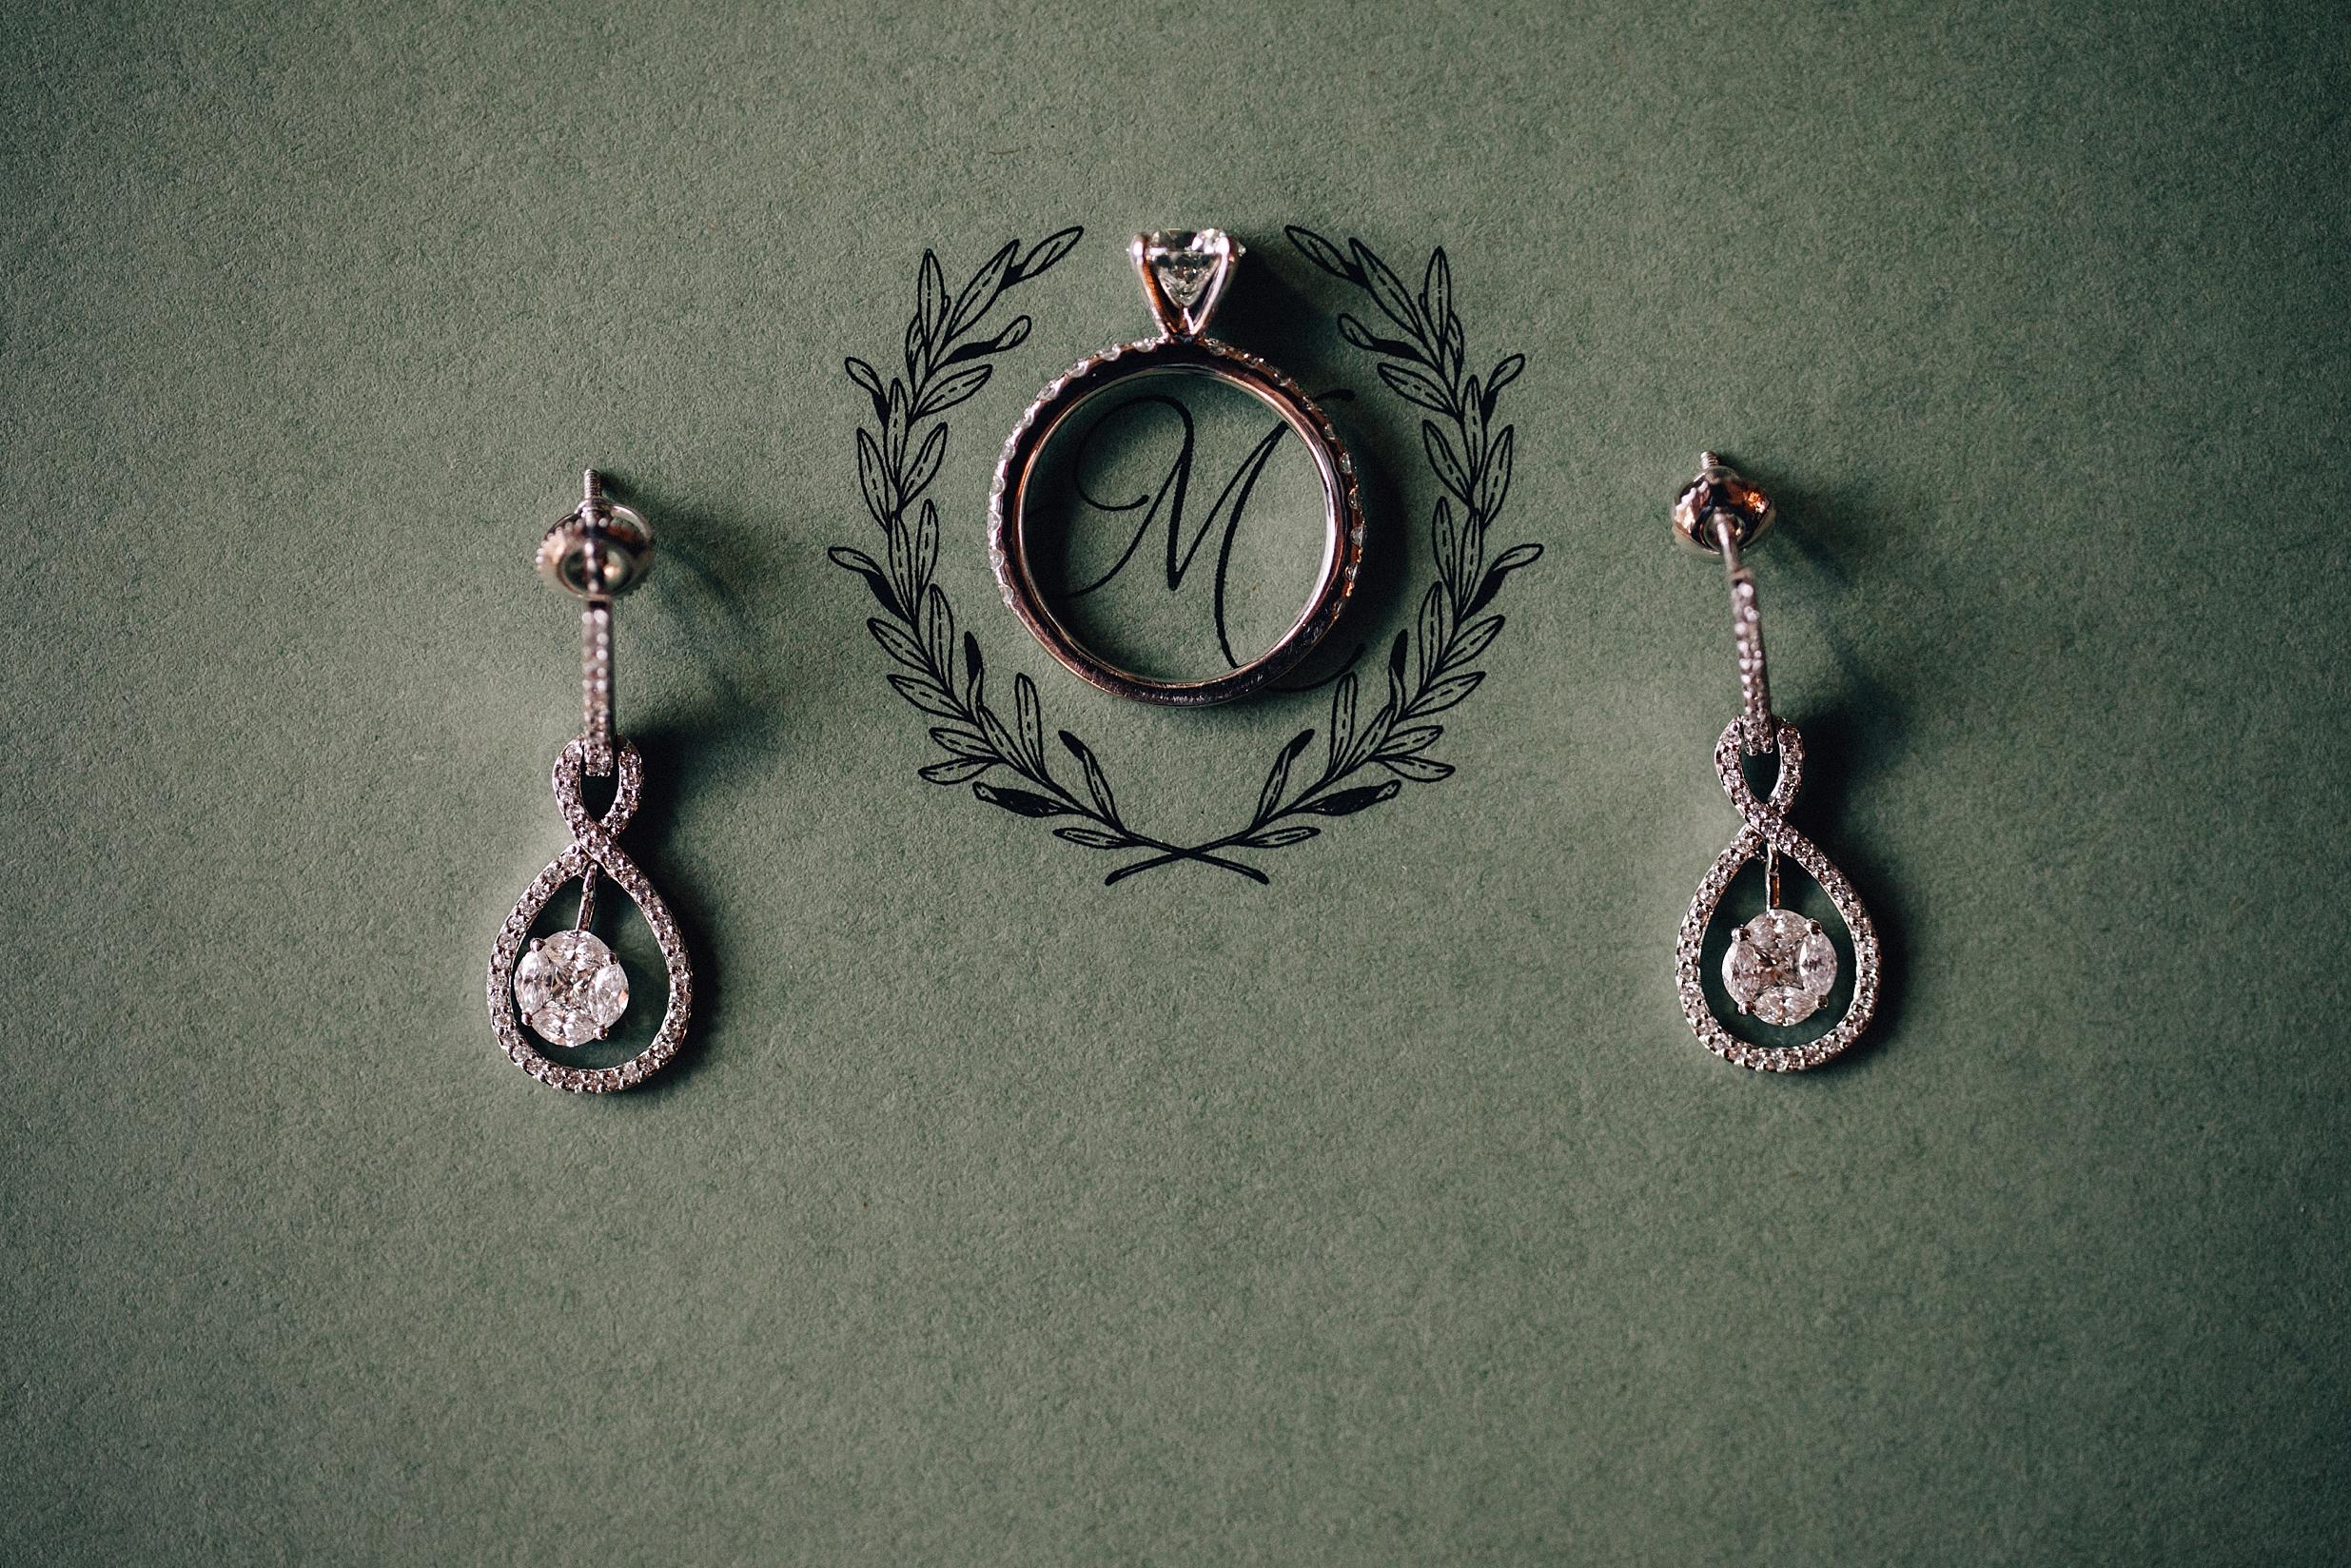 crossed-keys-estate-filipino-wedding-nj_0003.jpg